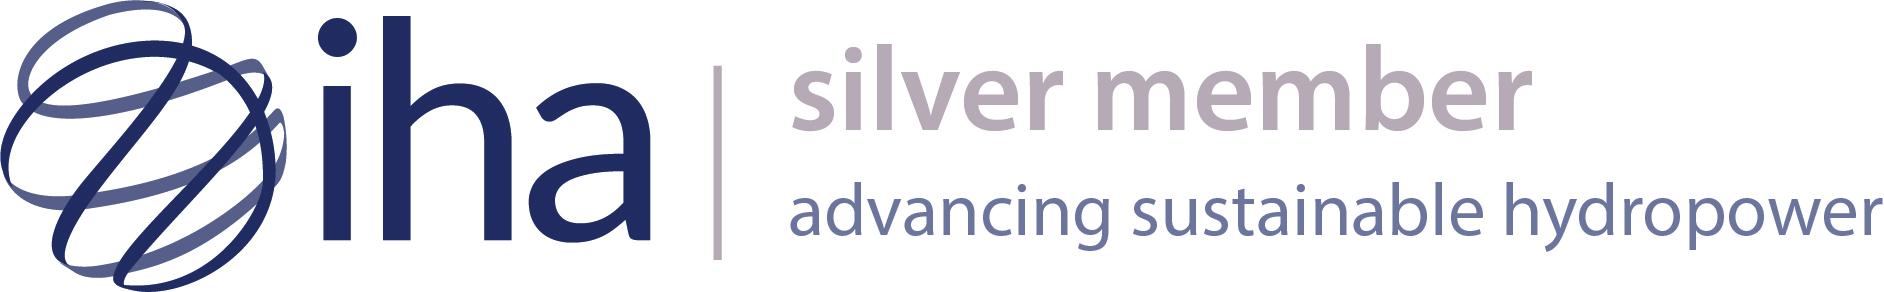 IHA silver member badge.jpg